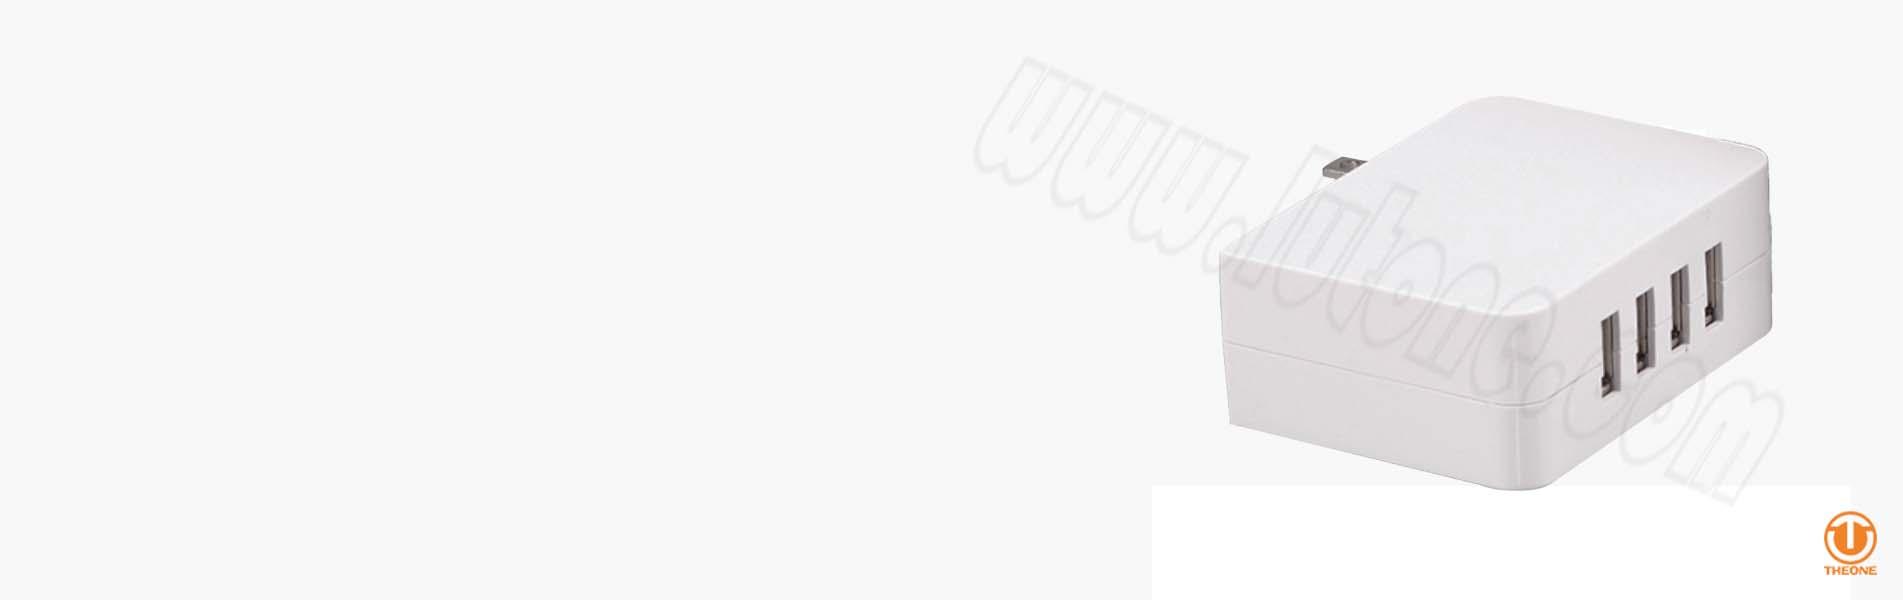 tk251-banner dual usb wall charger